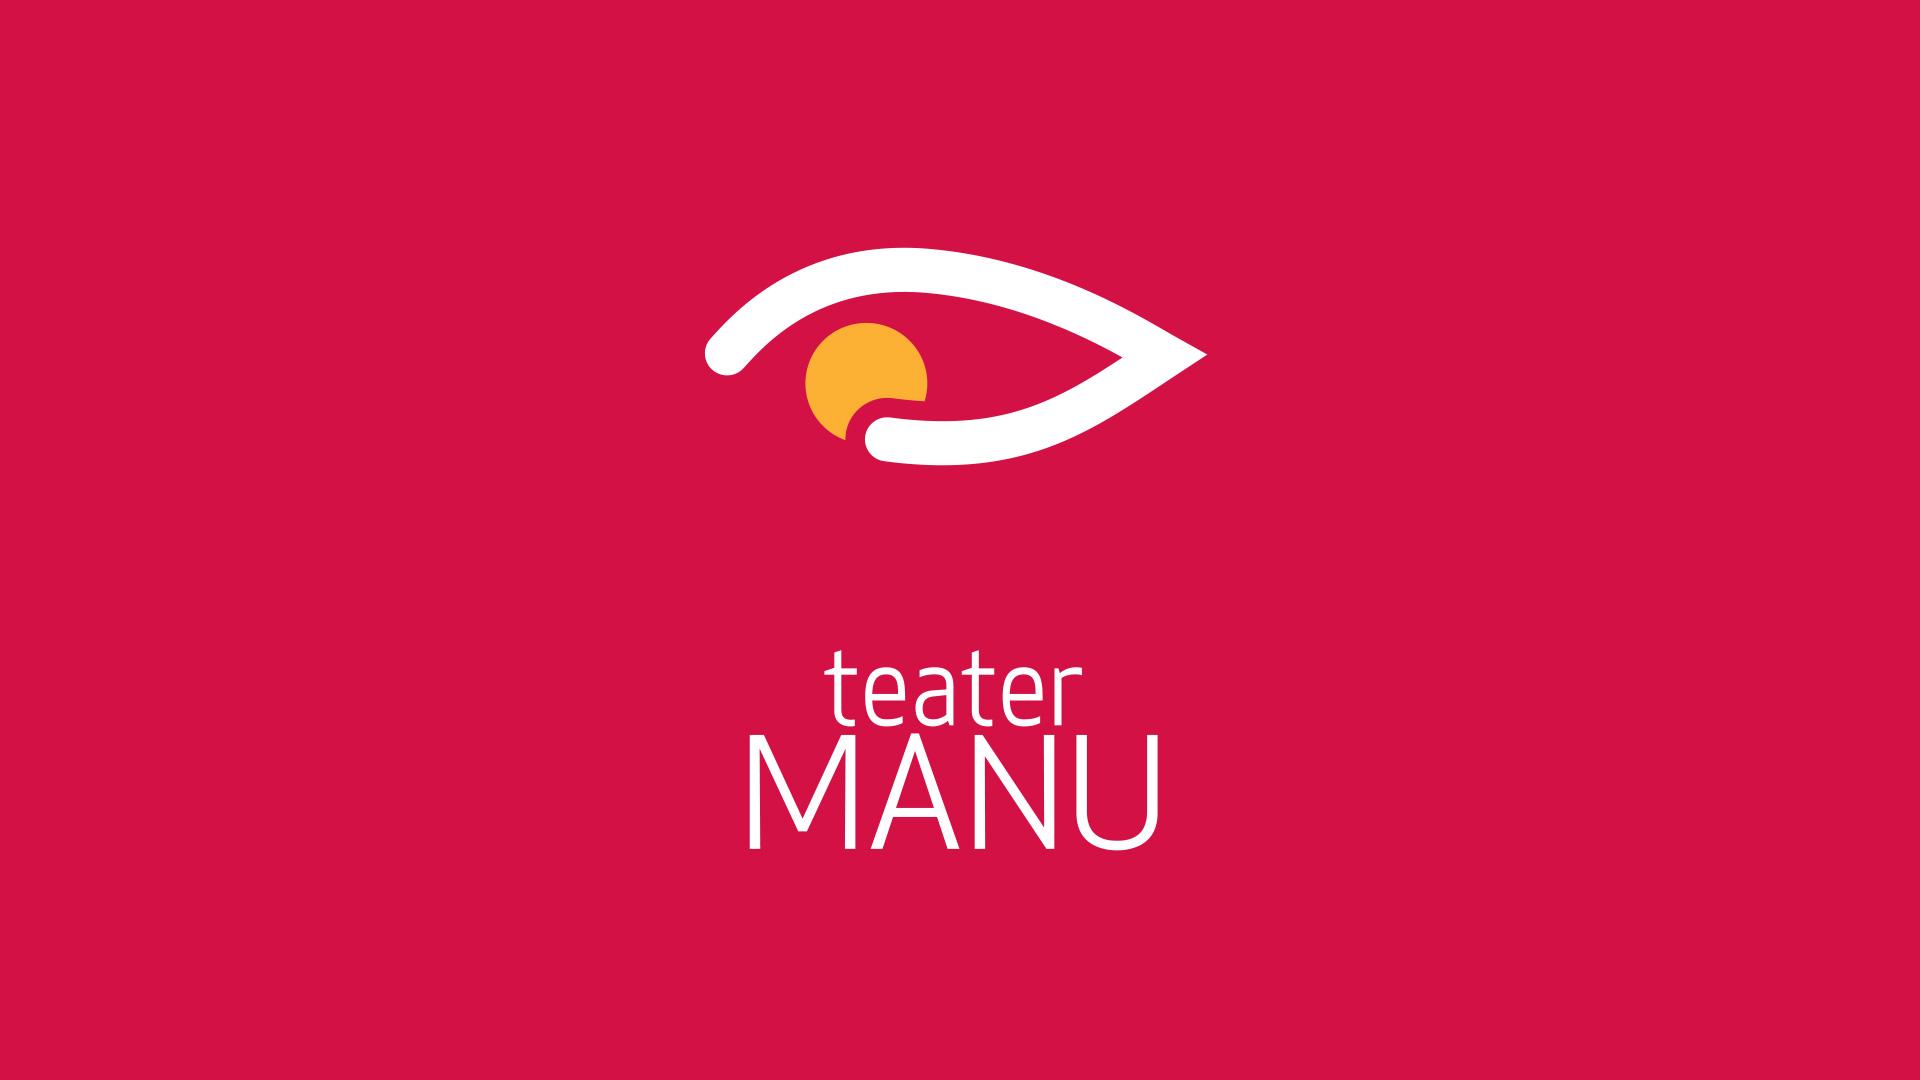 2001: Foundation of Teater Manu (Norway)